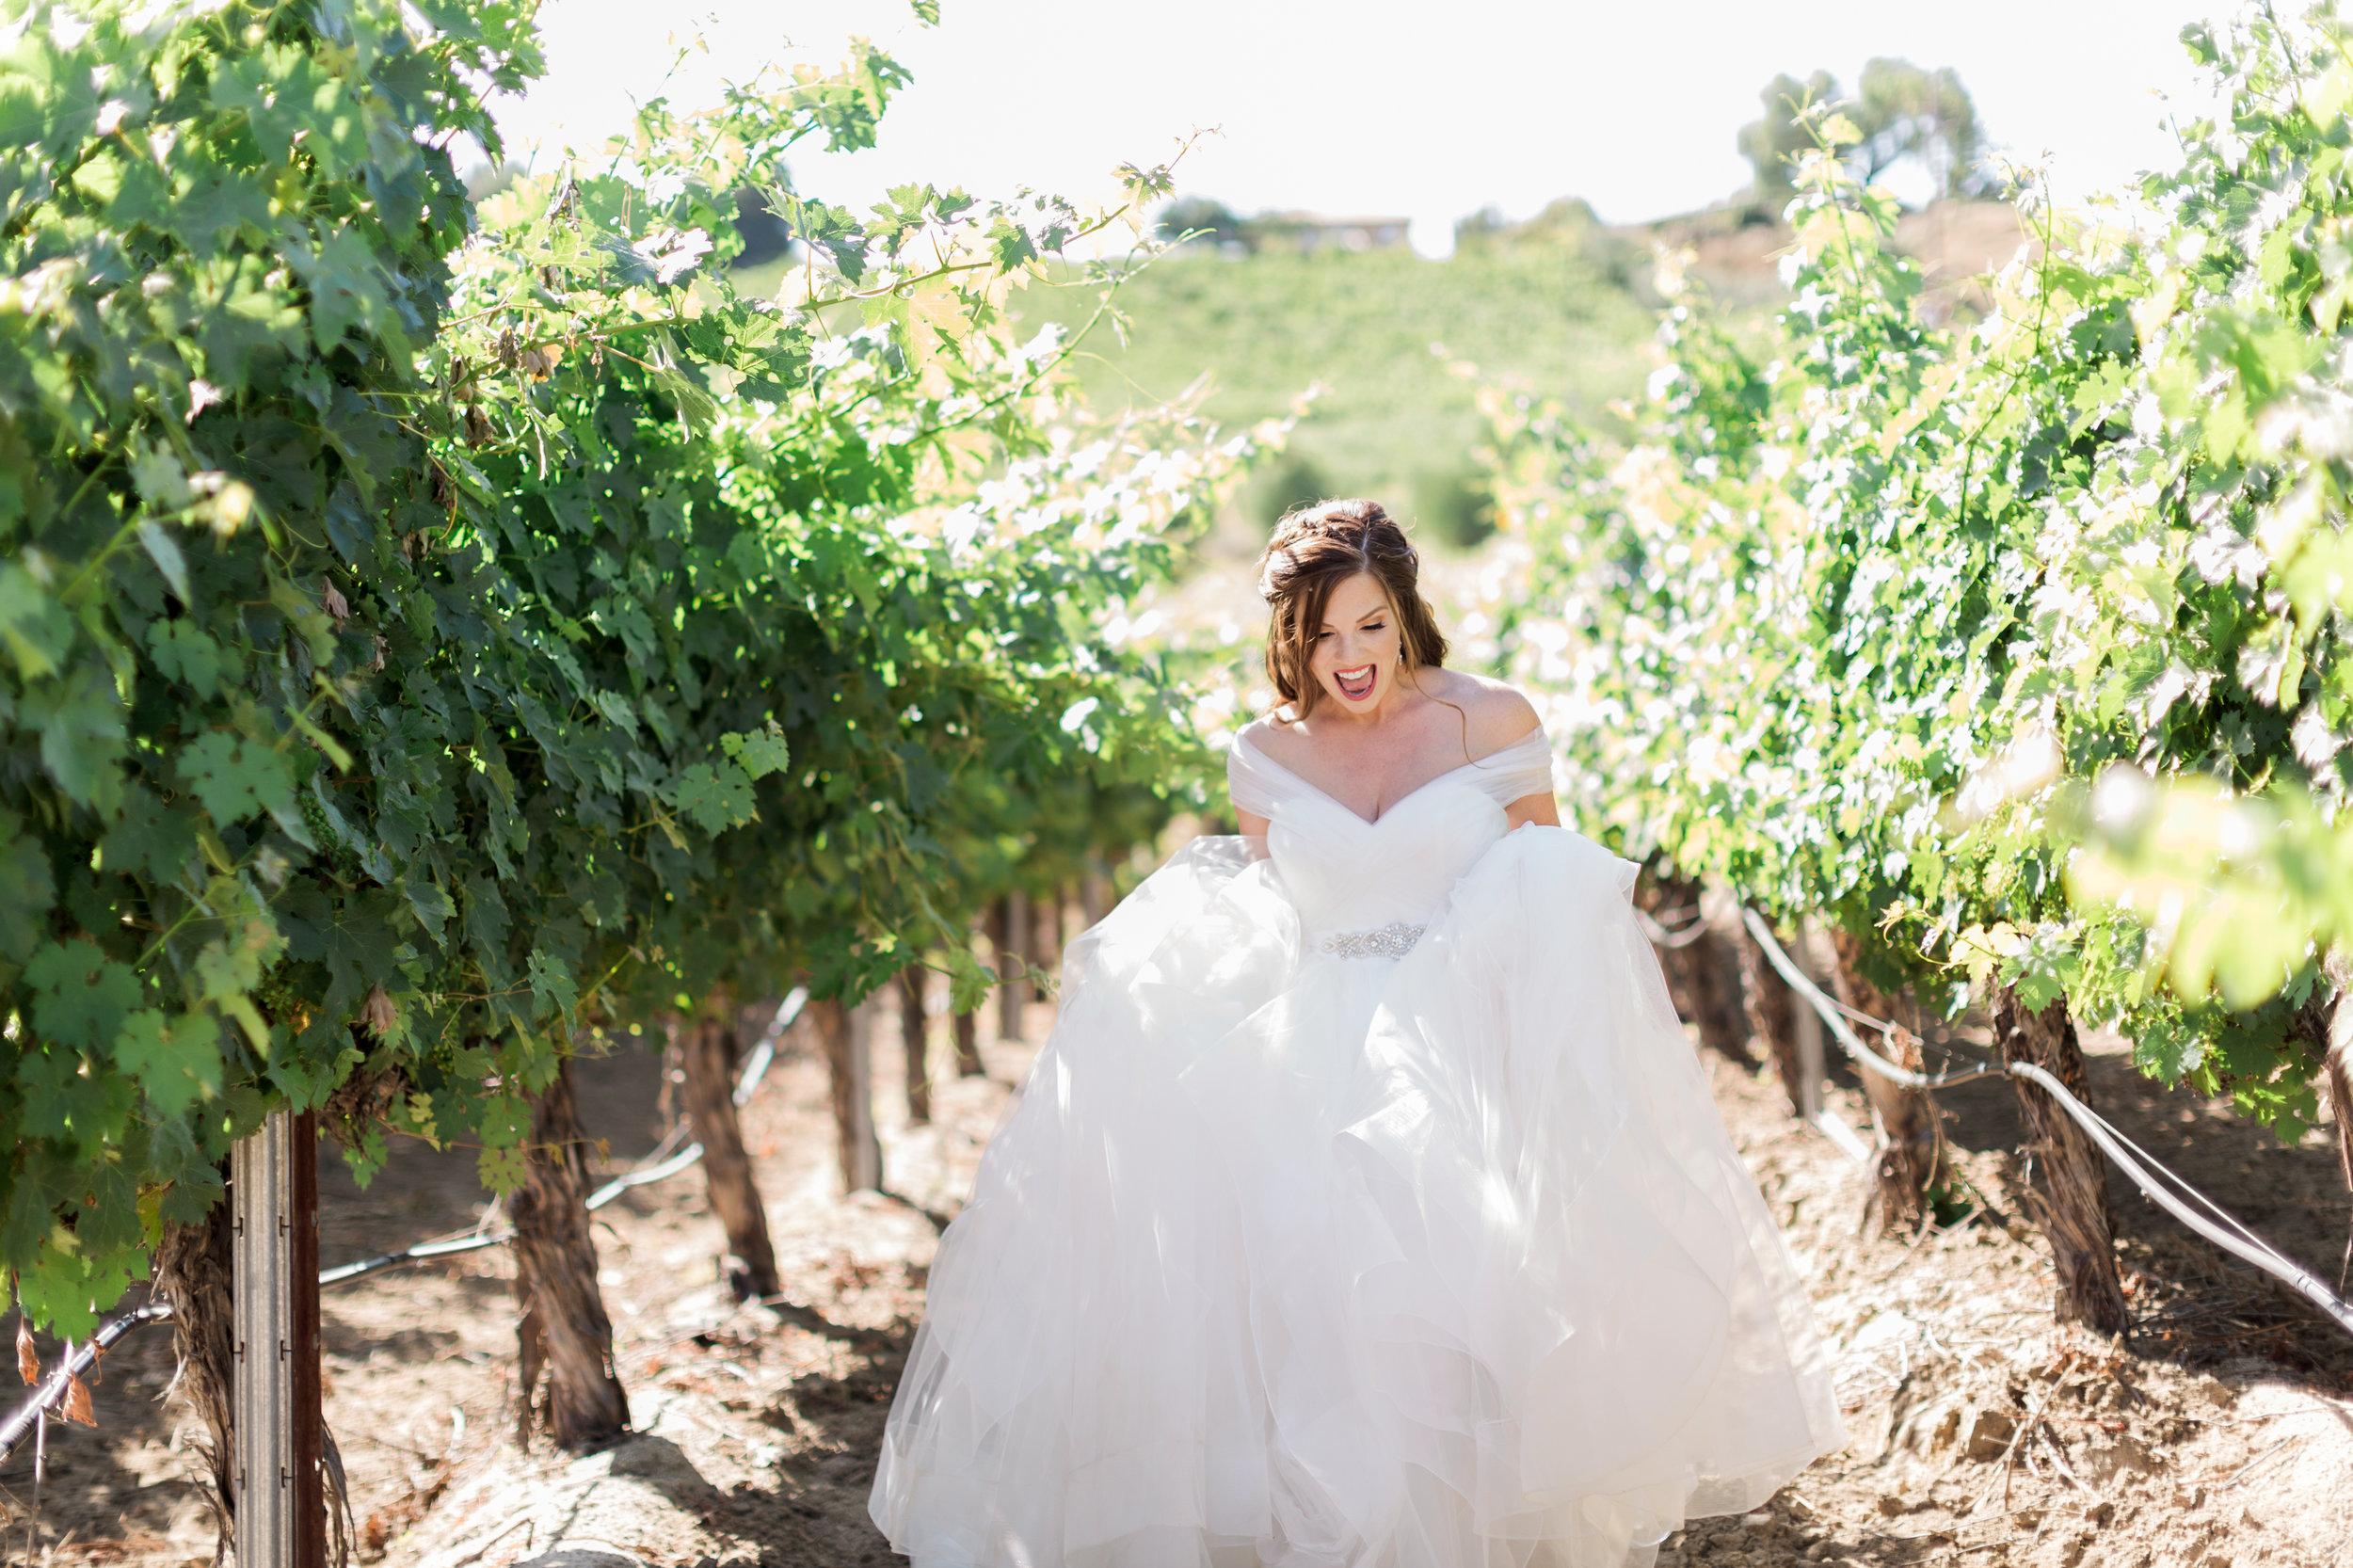 Leoness Cellars Winery Wedding Photographer Leah Vis  (2).jpg